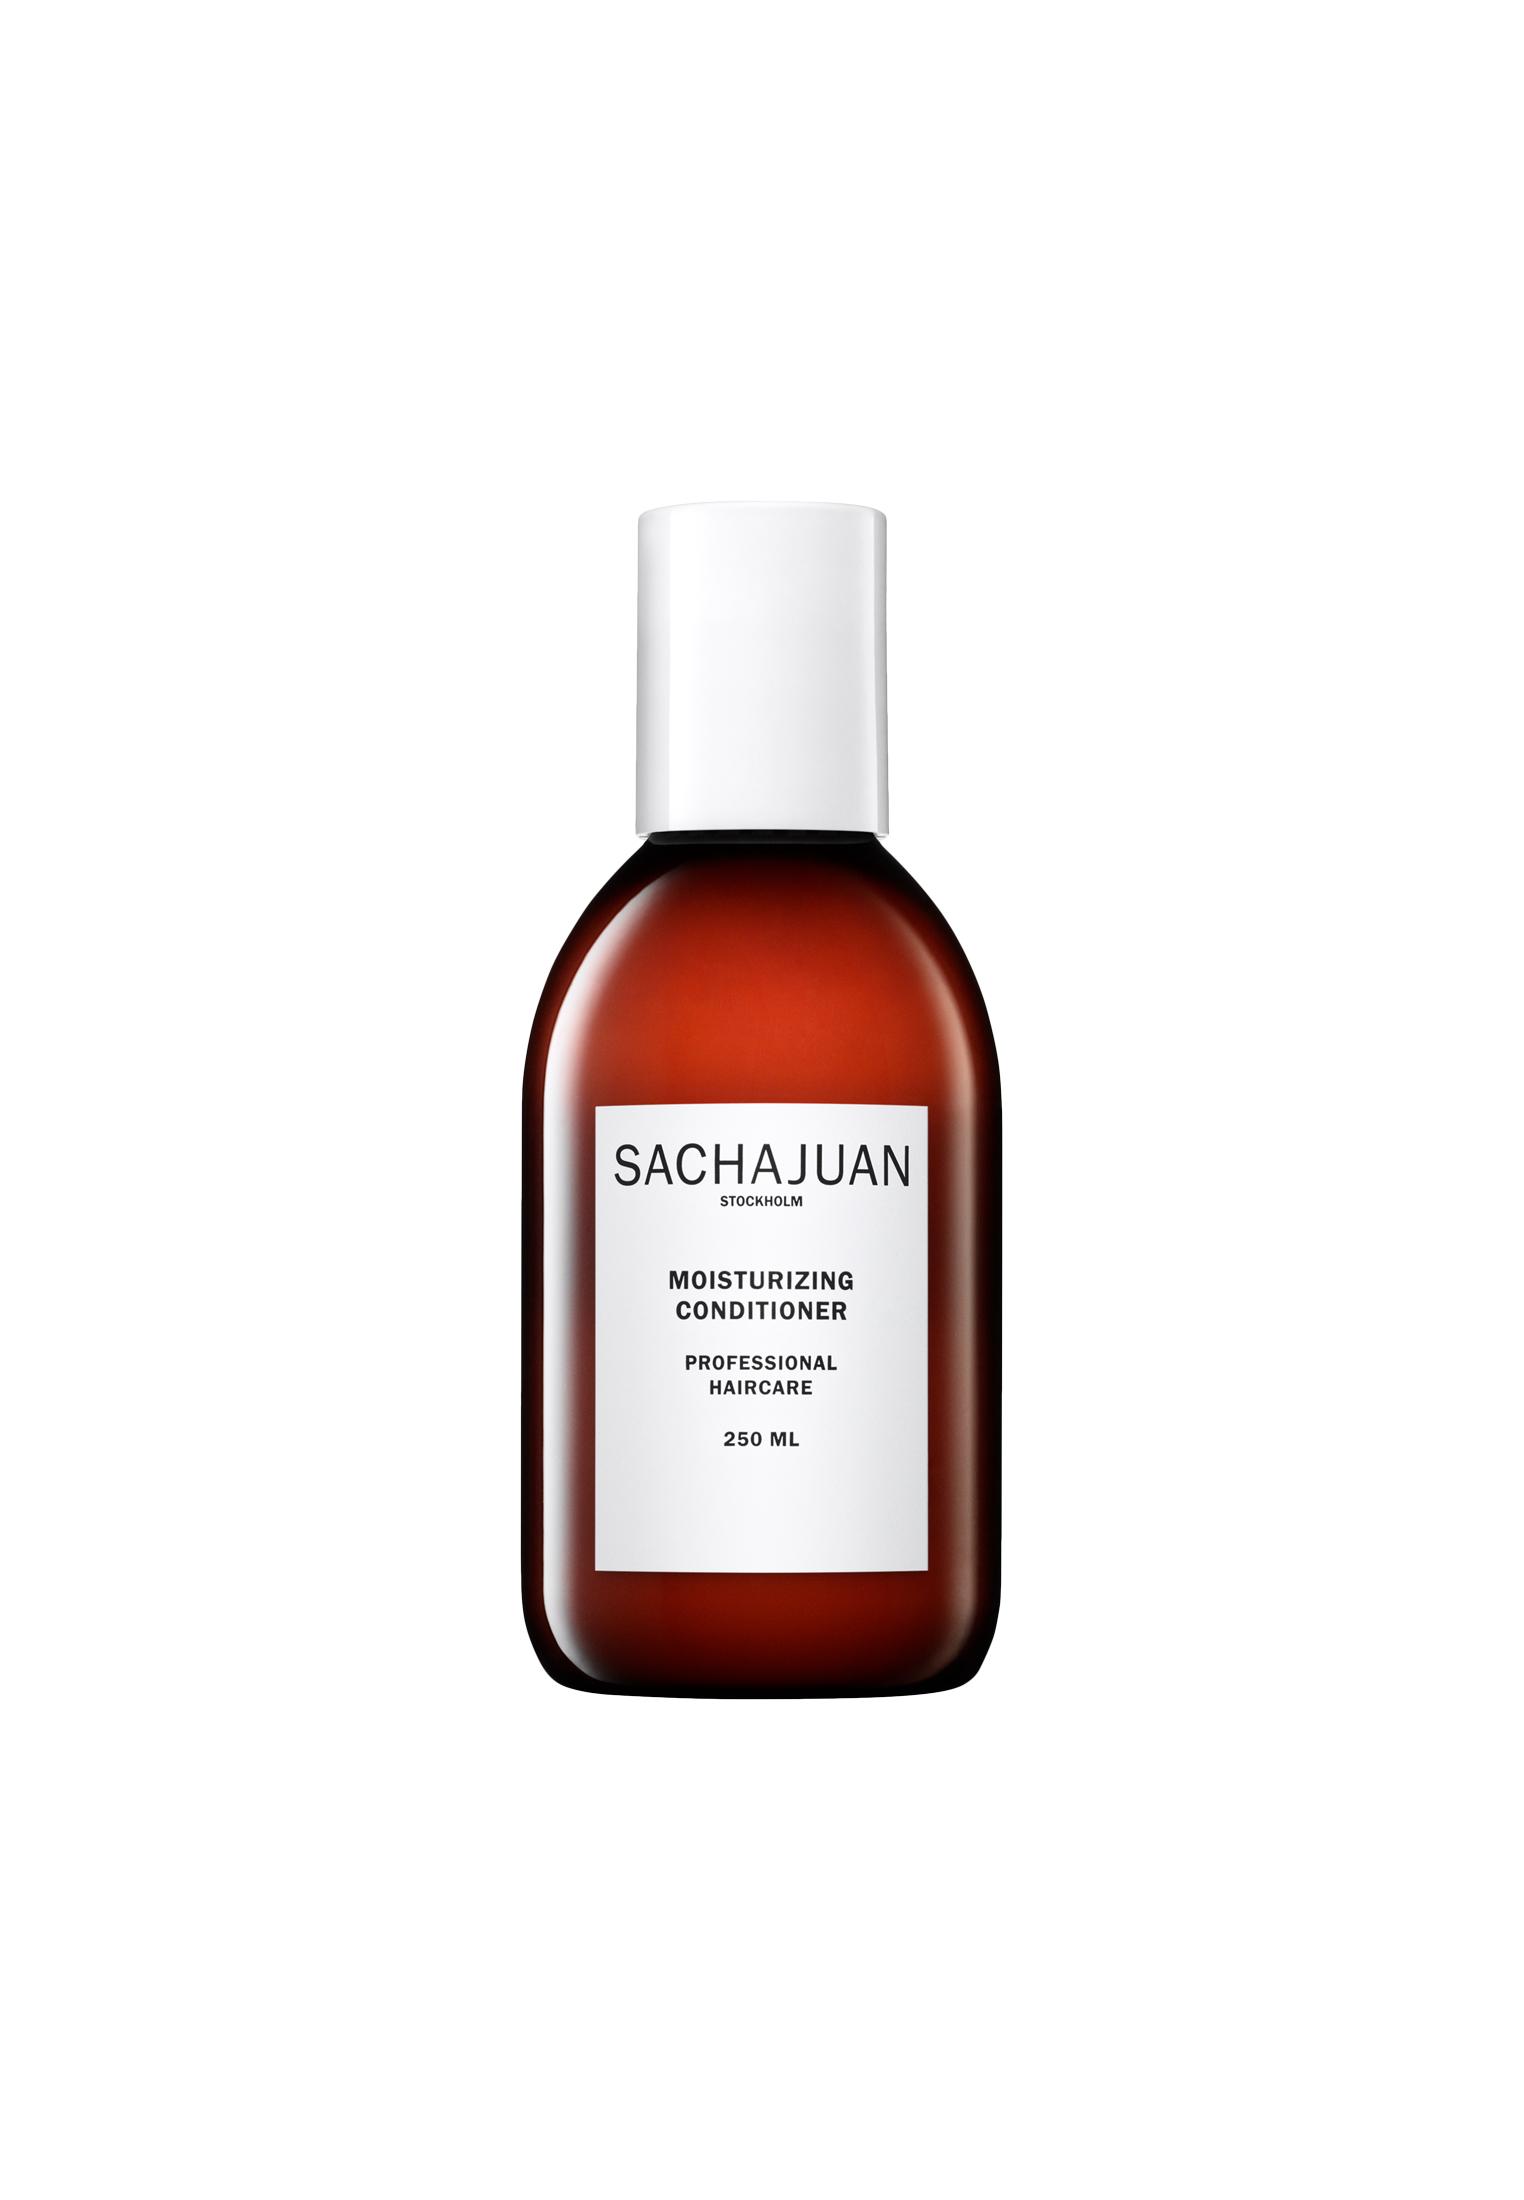 SACHAJUAN - Moisturizing Conditioner - 250 ml